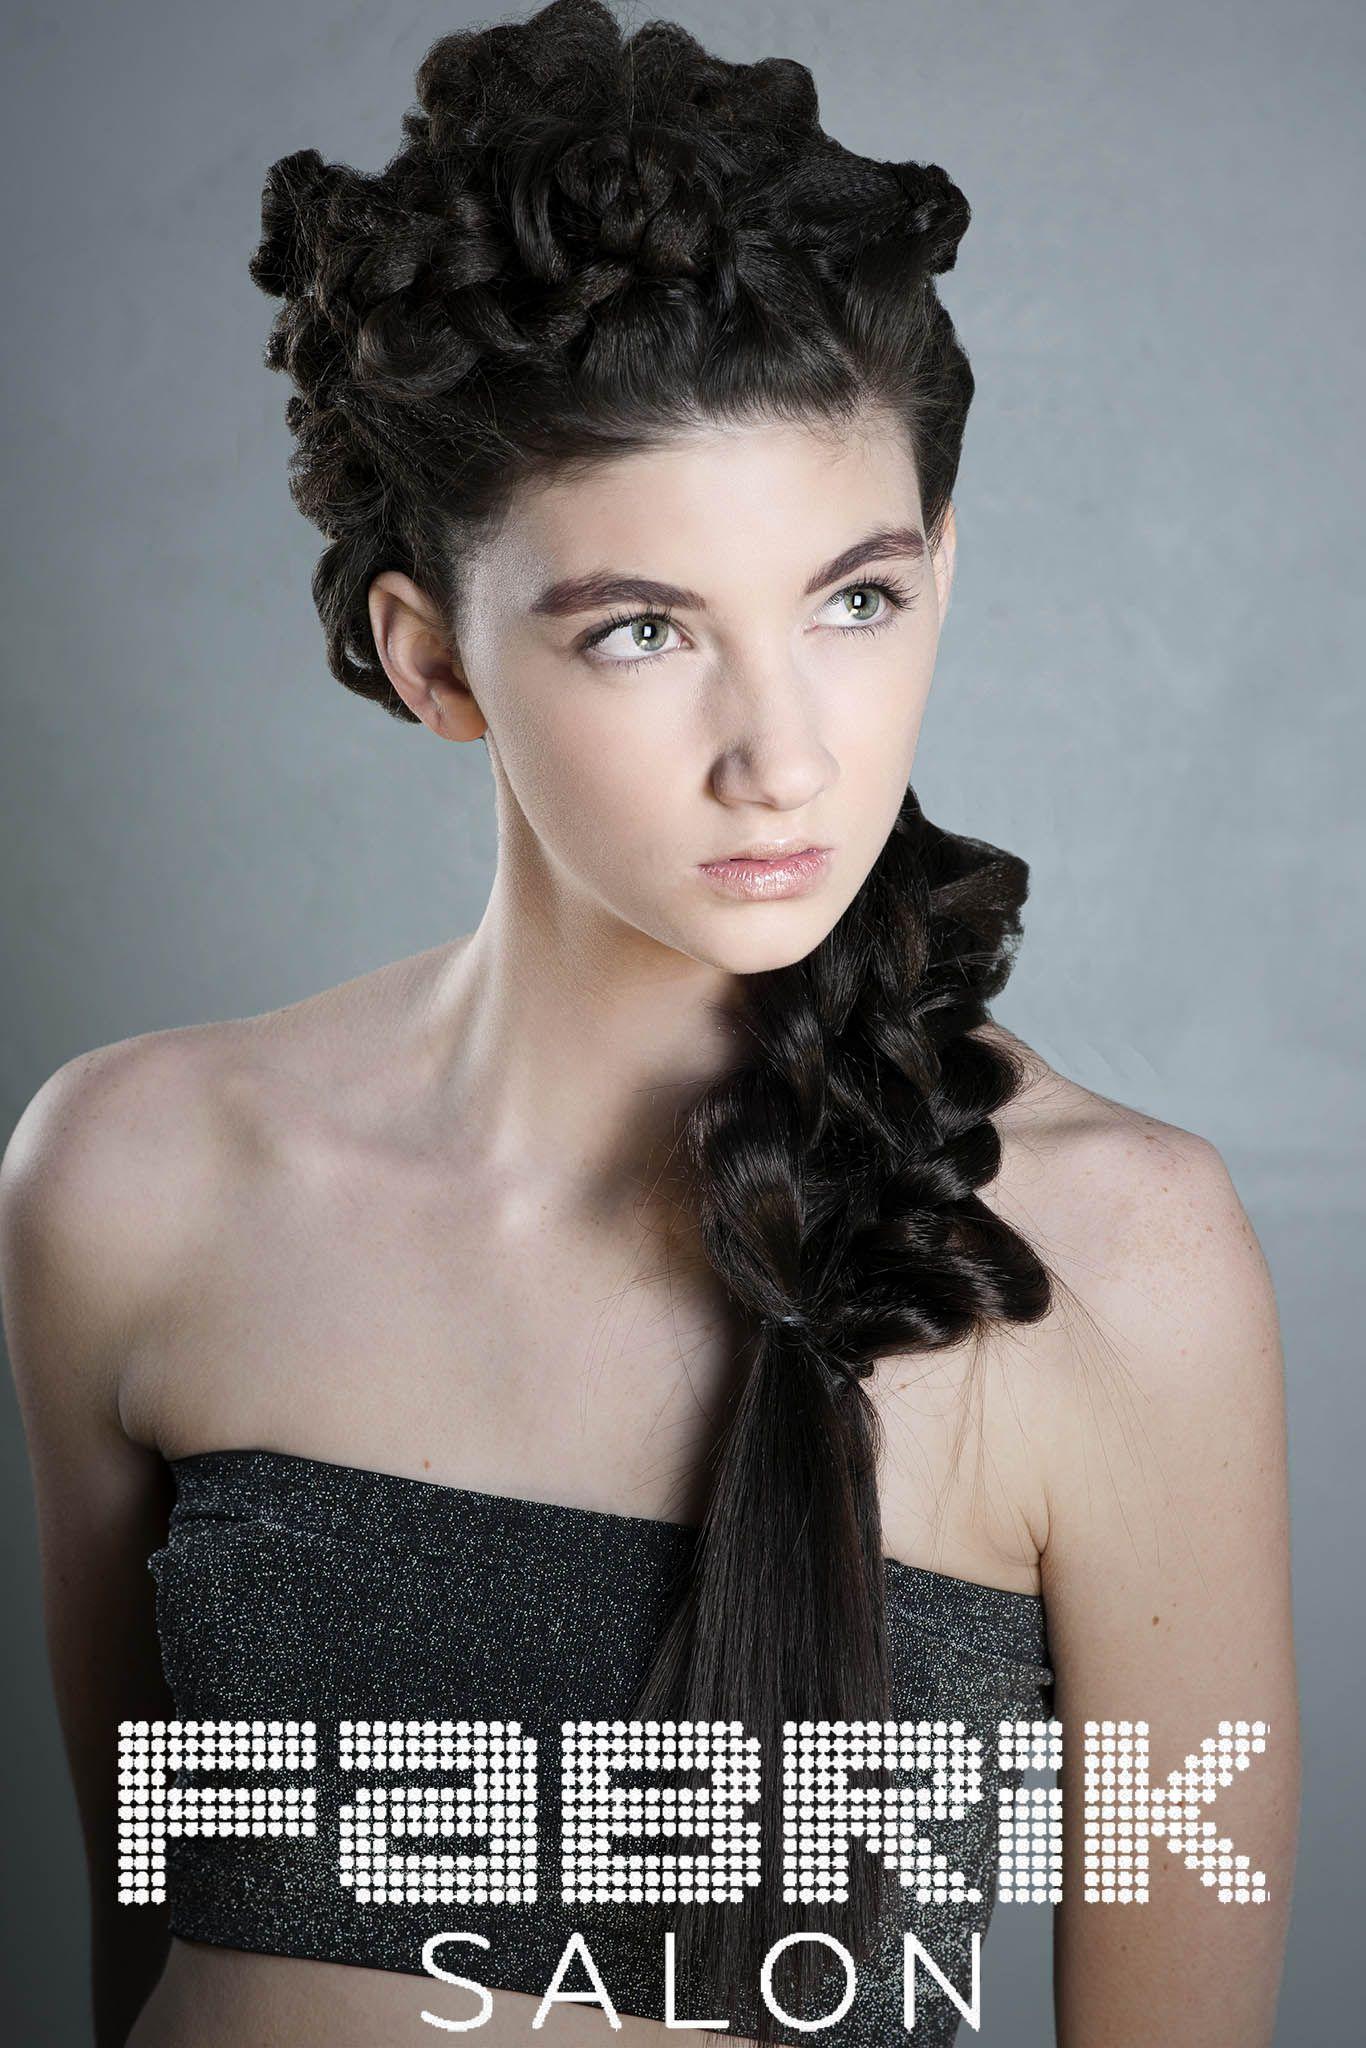 Danielle Ford Photography Fabrik Salon Missoula Montana - Haircut missoula